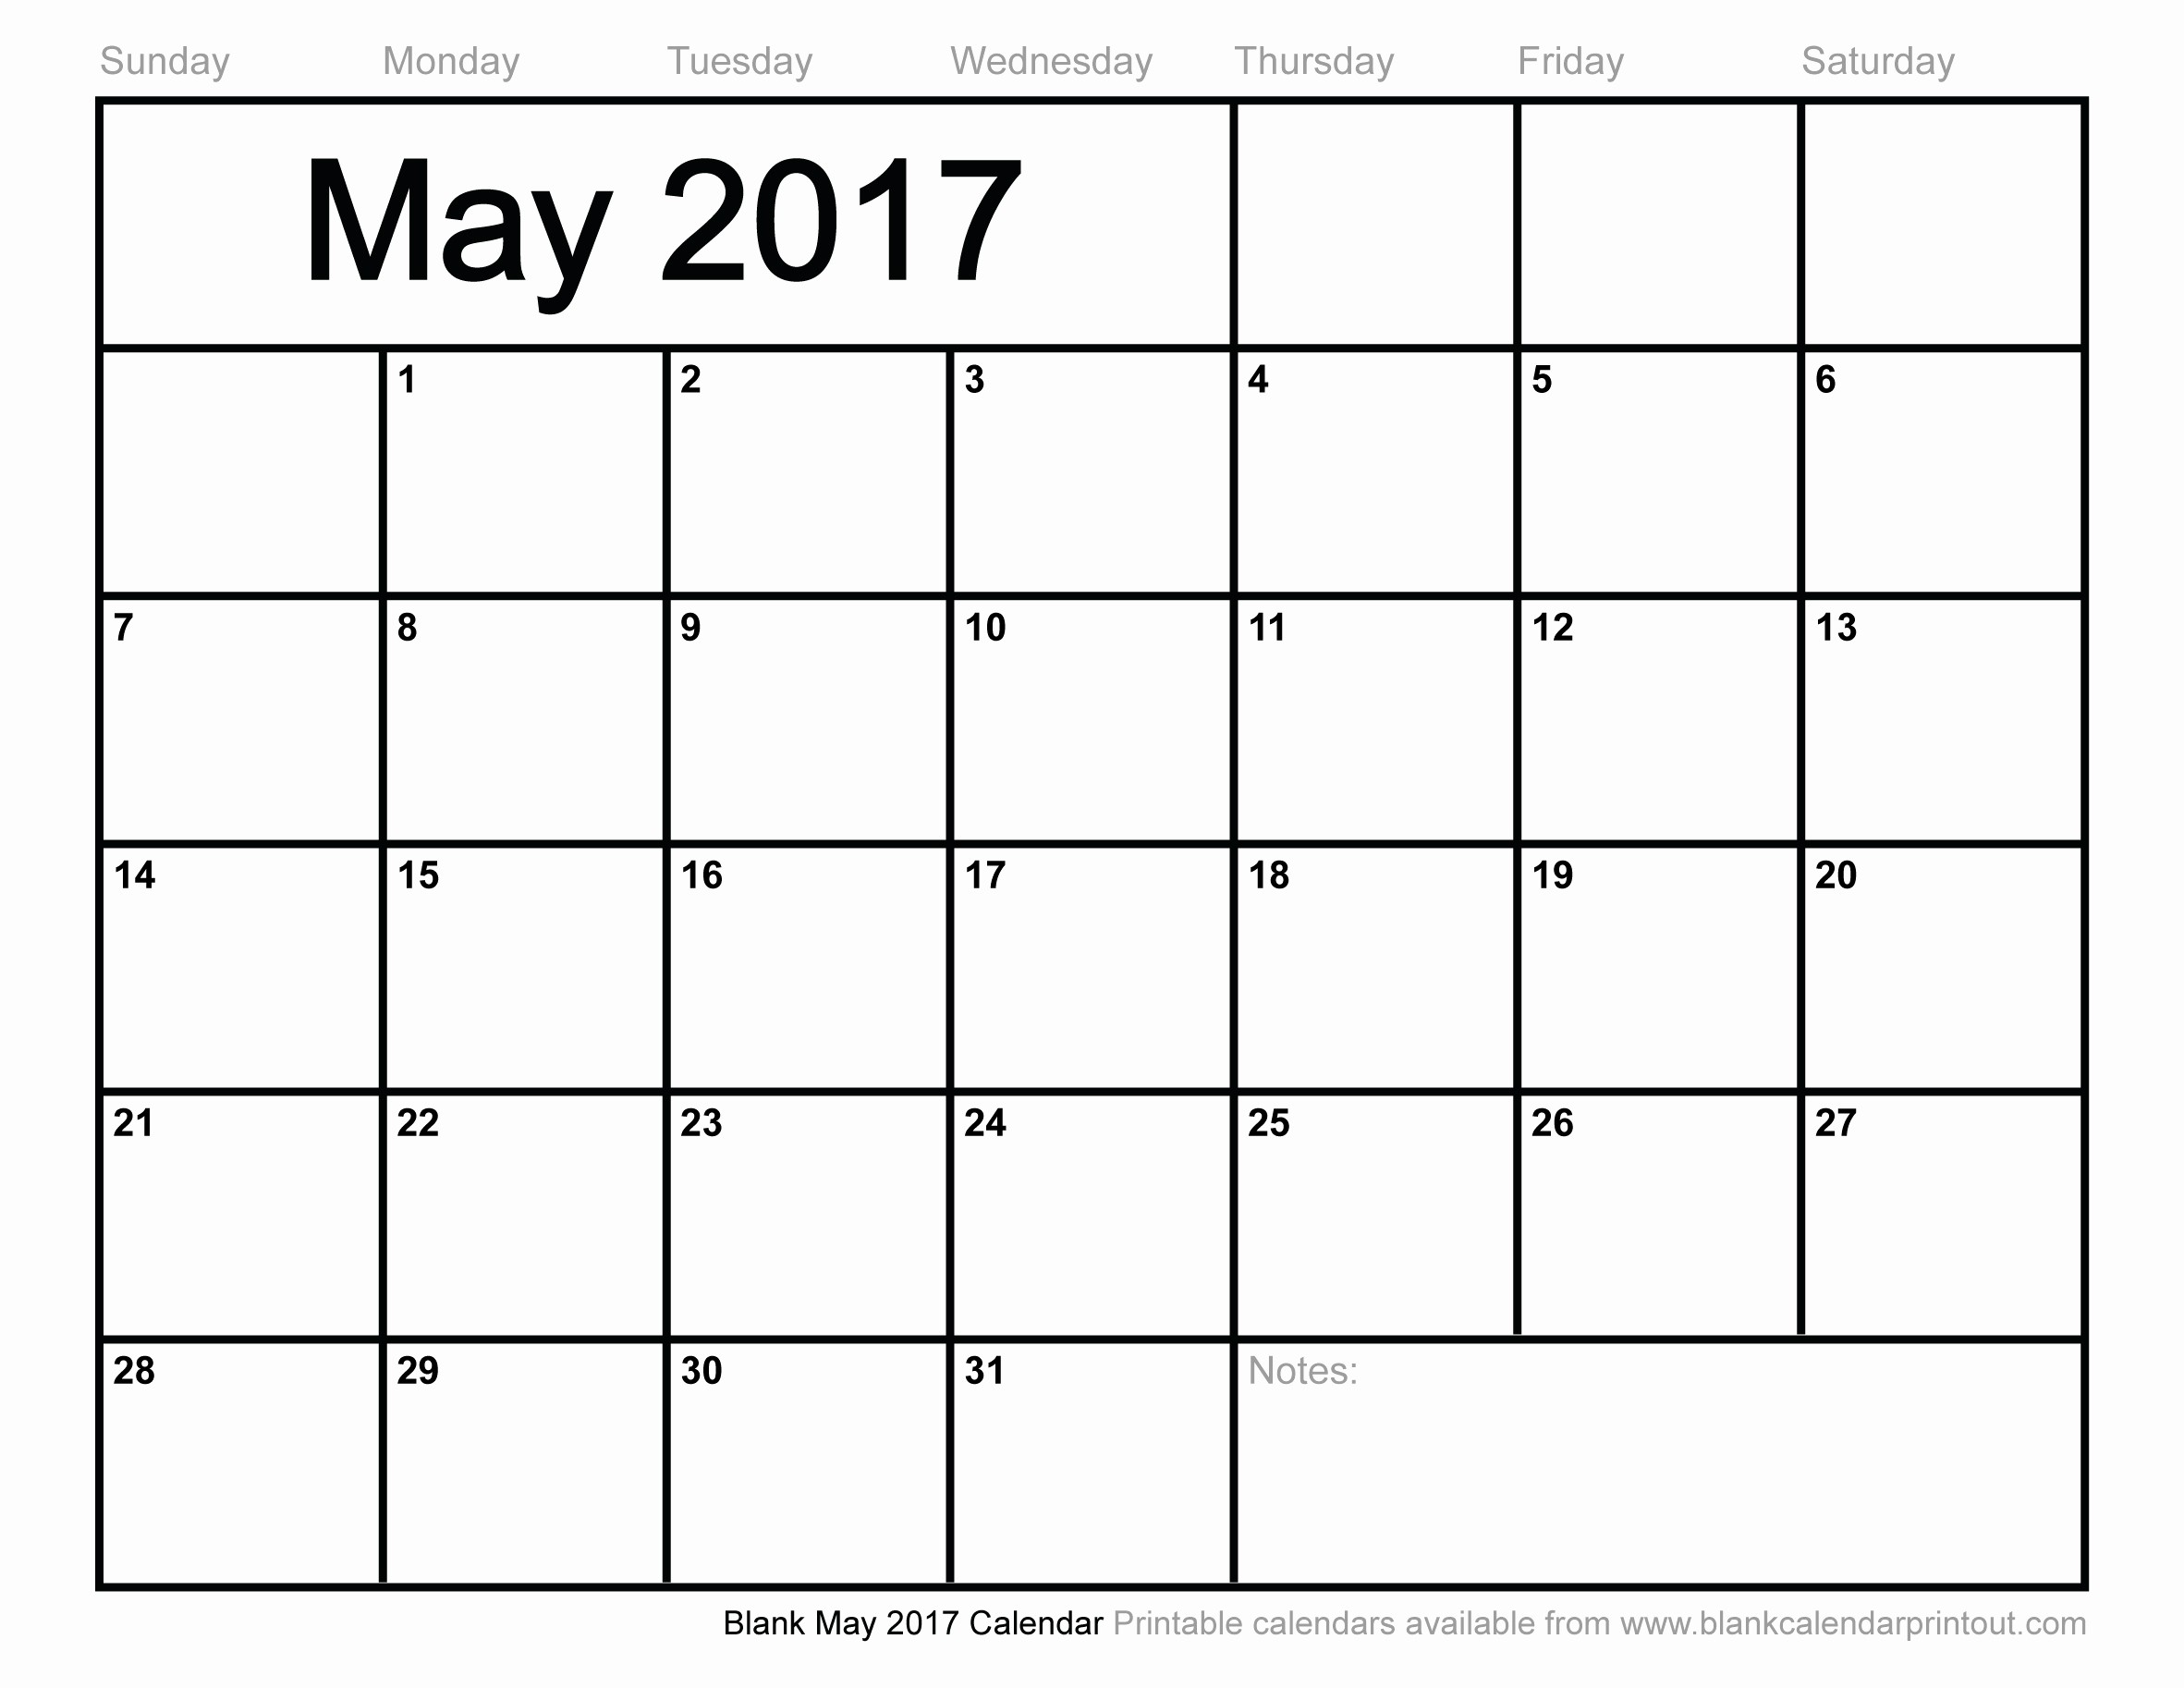 Blank Monthly Calendar 2017 Printable Luxury Blank May 2017 Calendar to Print